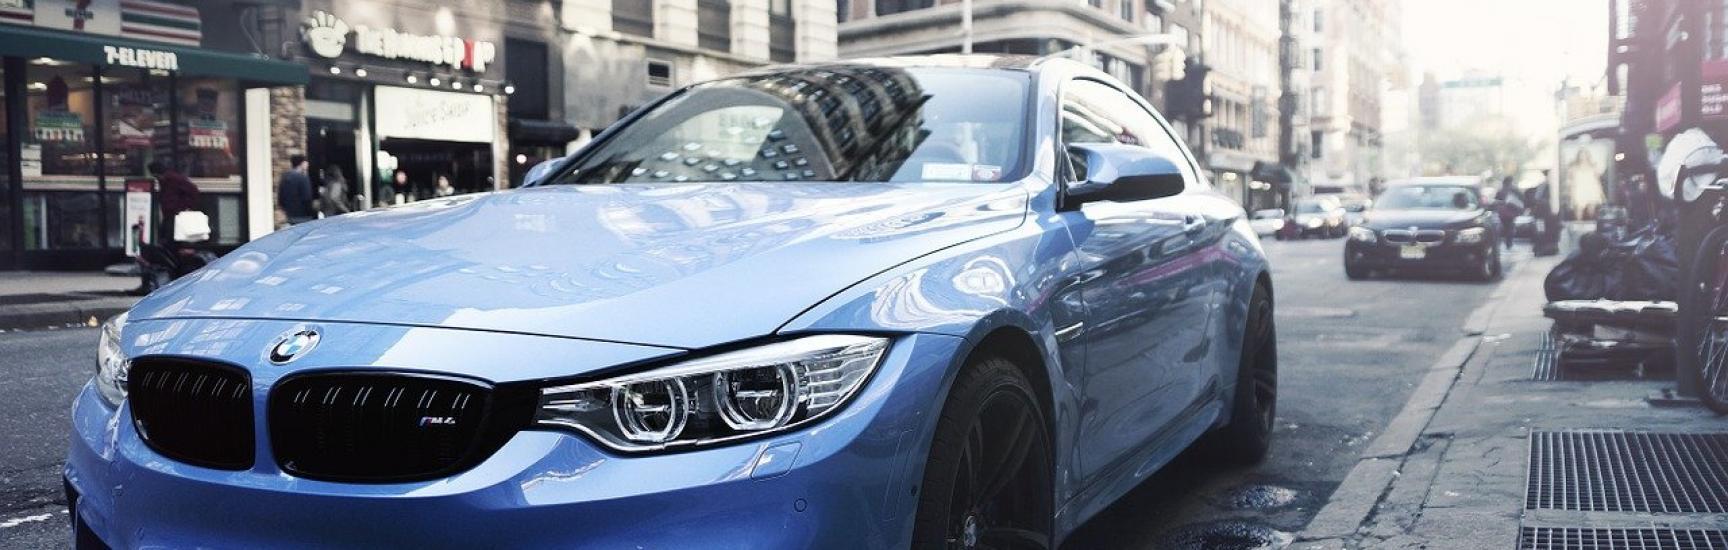 non-owner car insurance canada